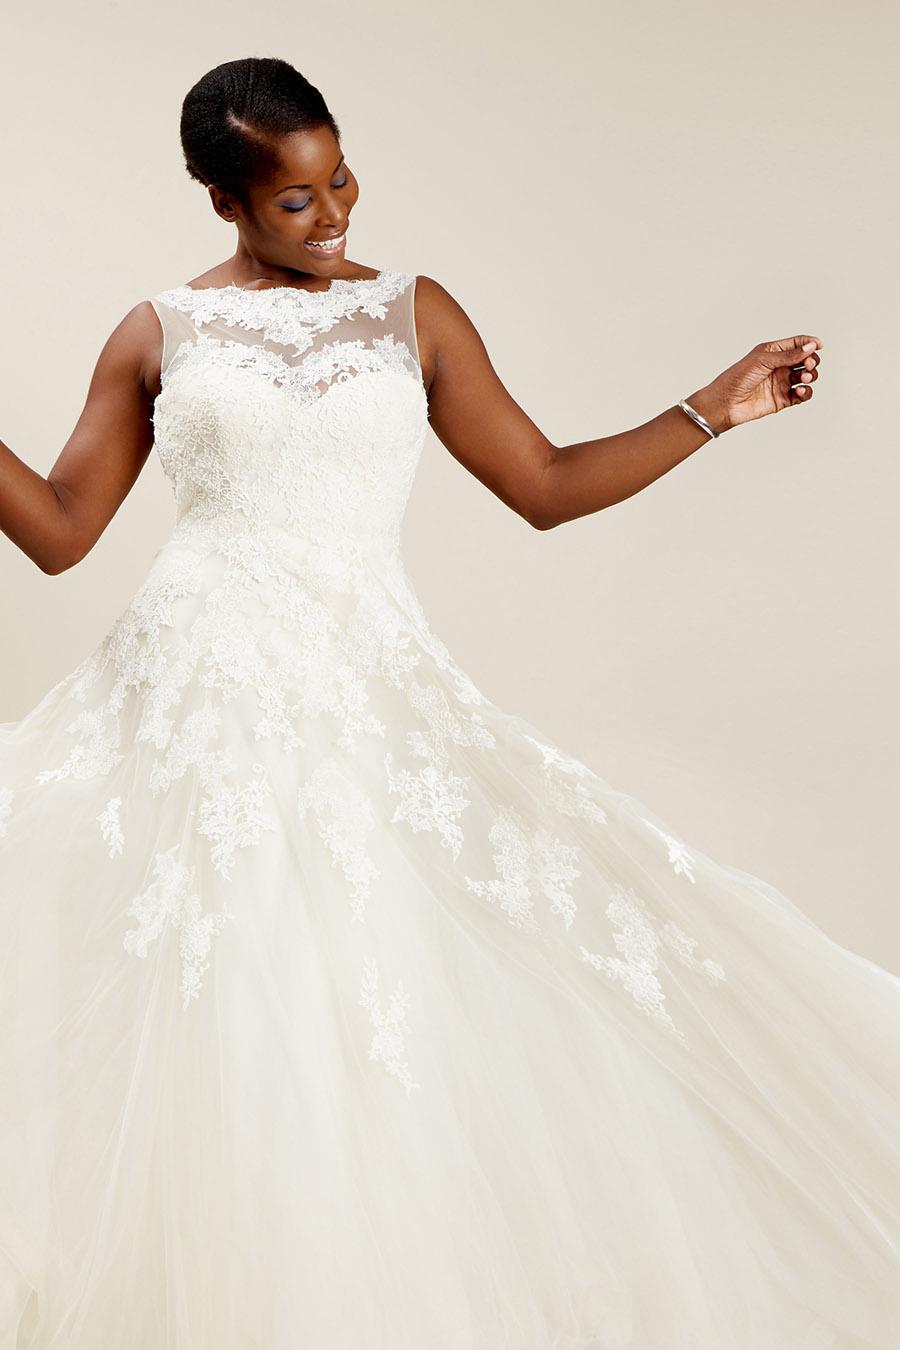 preloved wedding dresses charity wedding dress Brides Do Good UK (8)